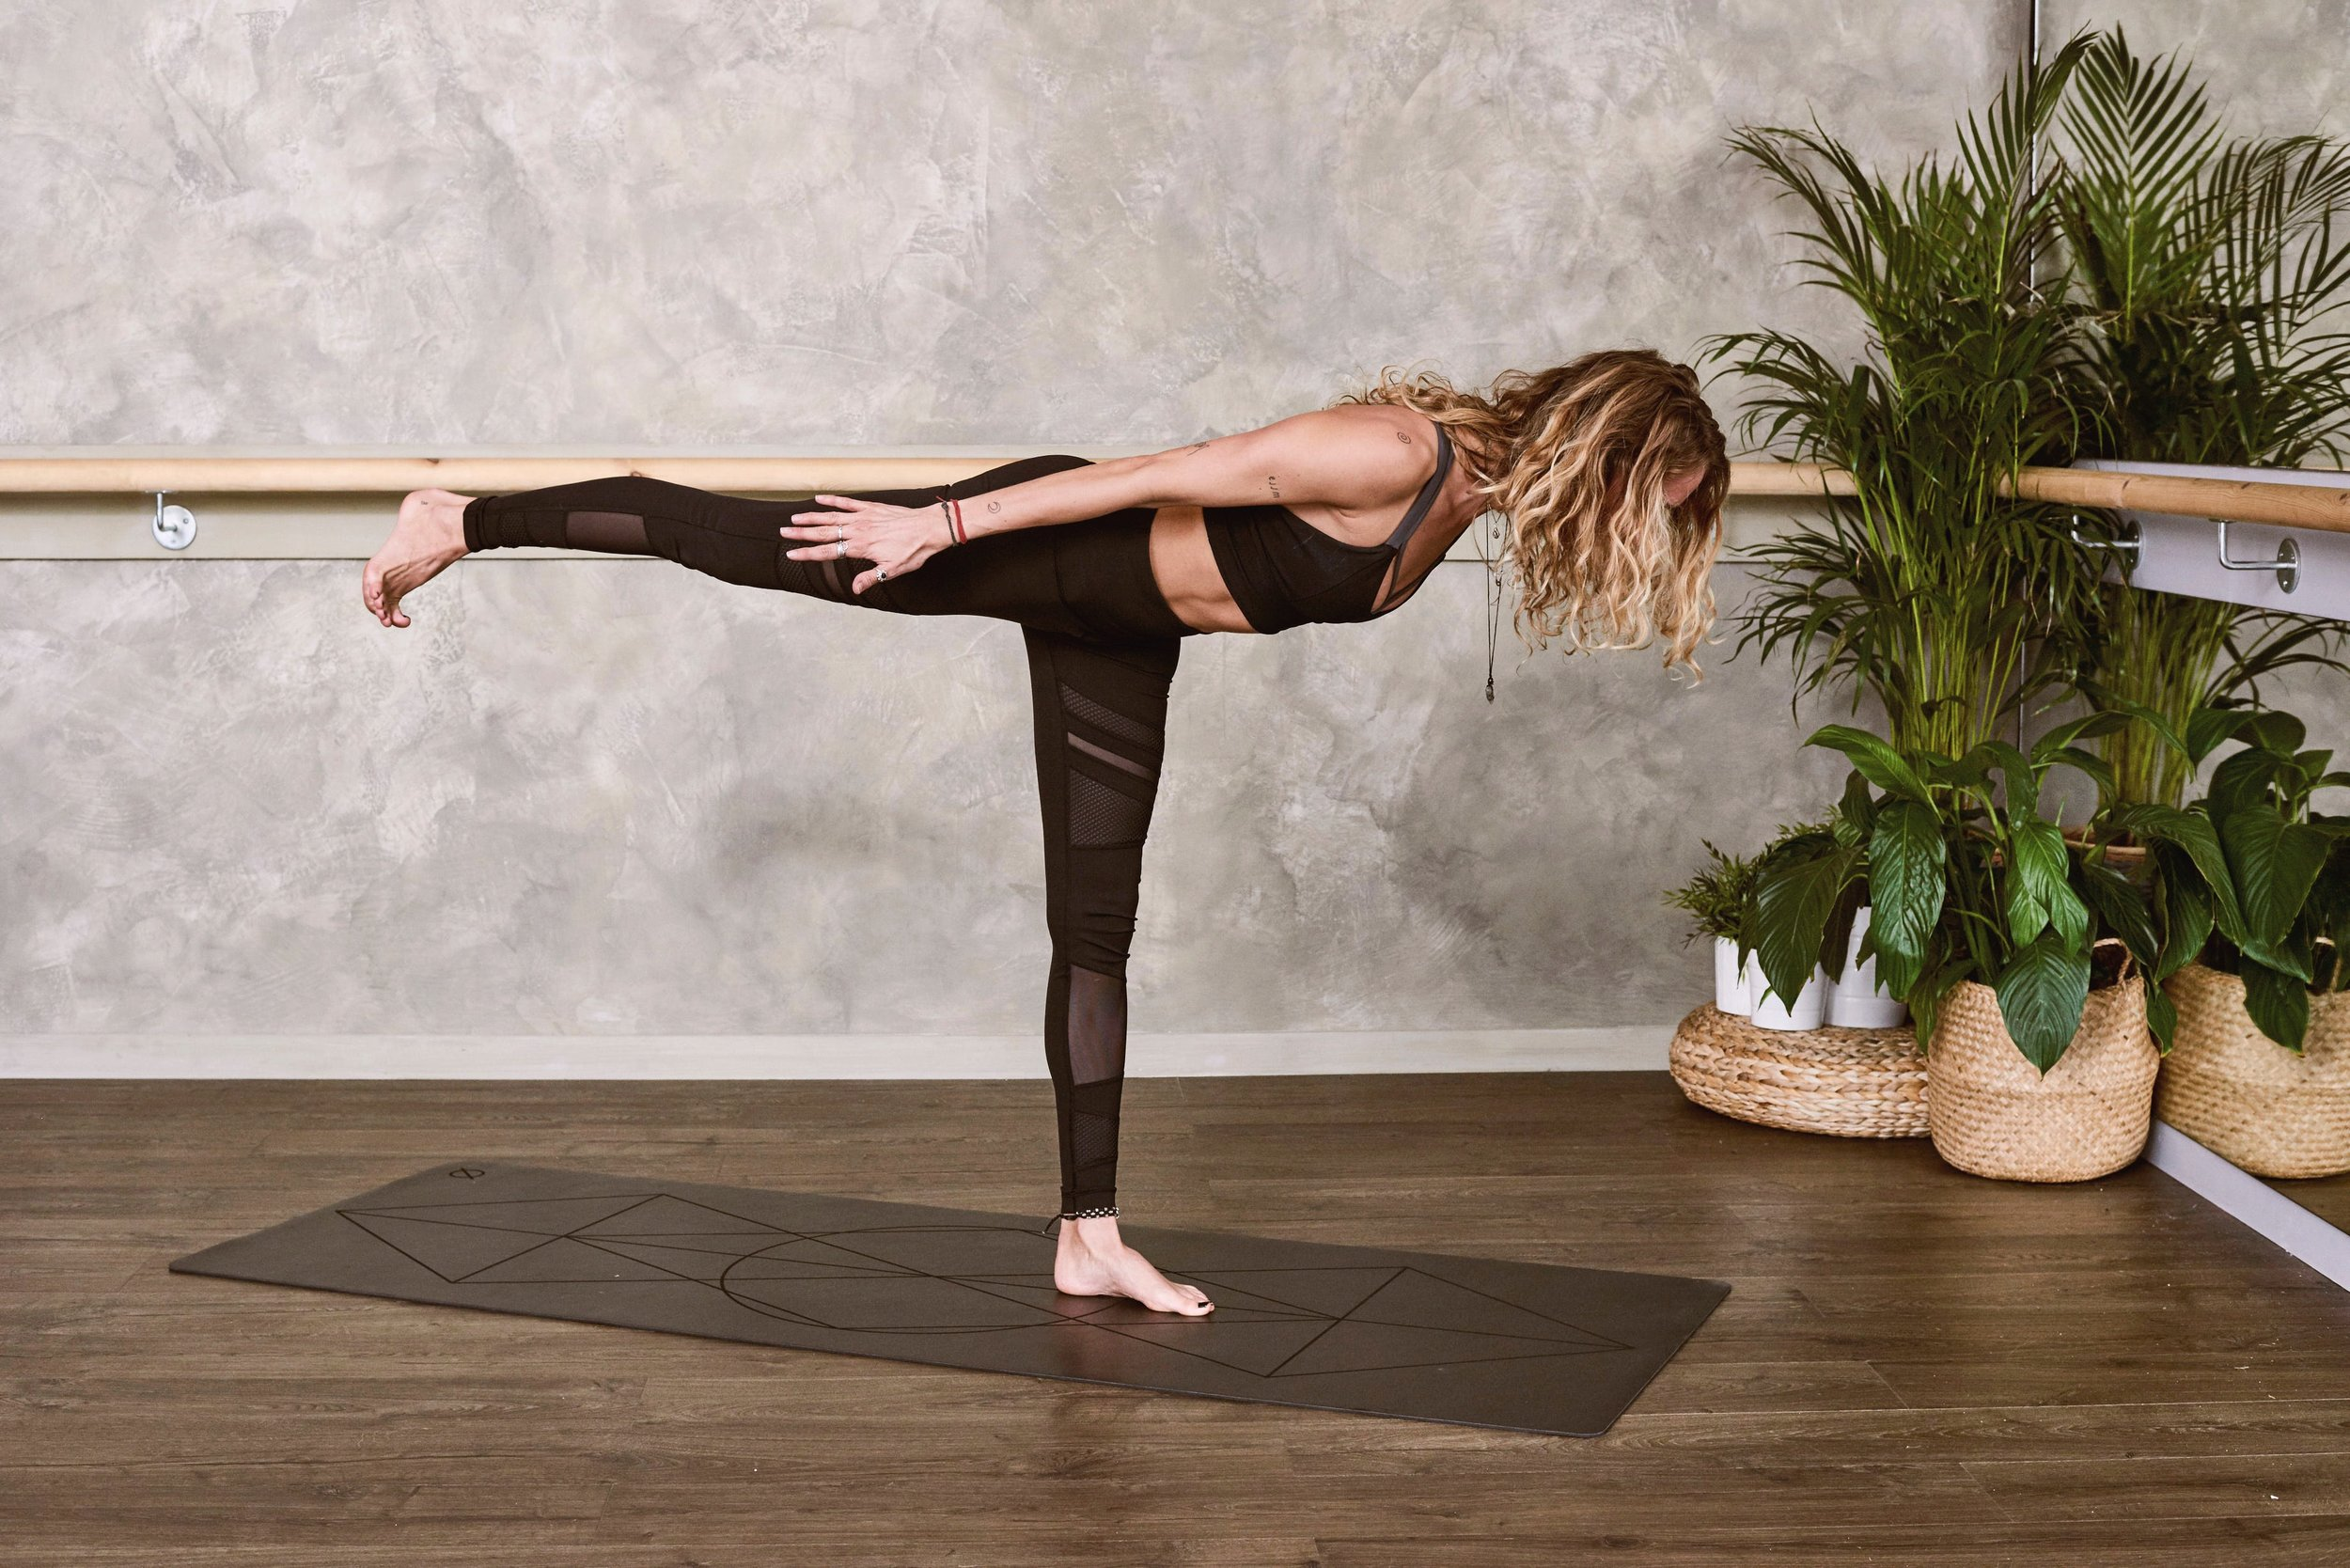 acro-pose-acro-yoga-acro-yoga-pose-1881993.jpg